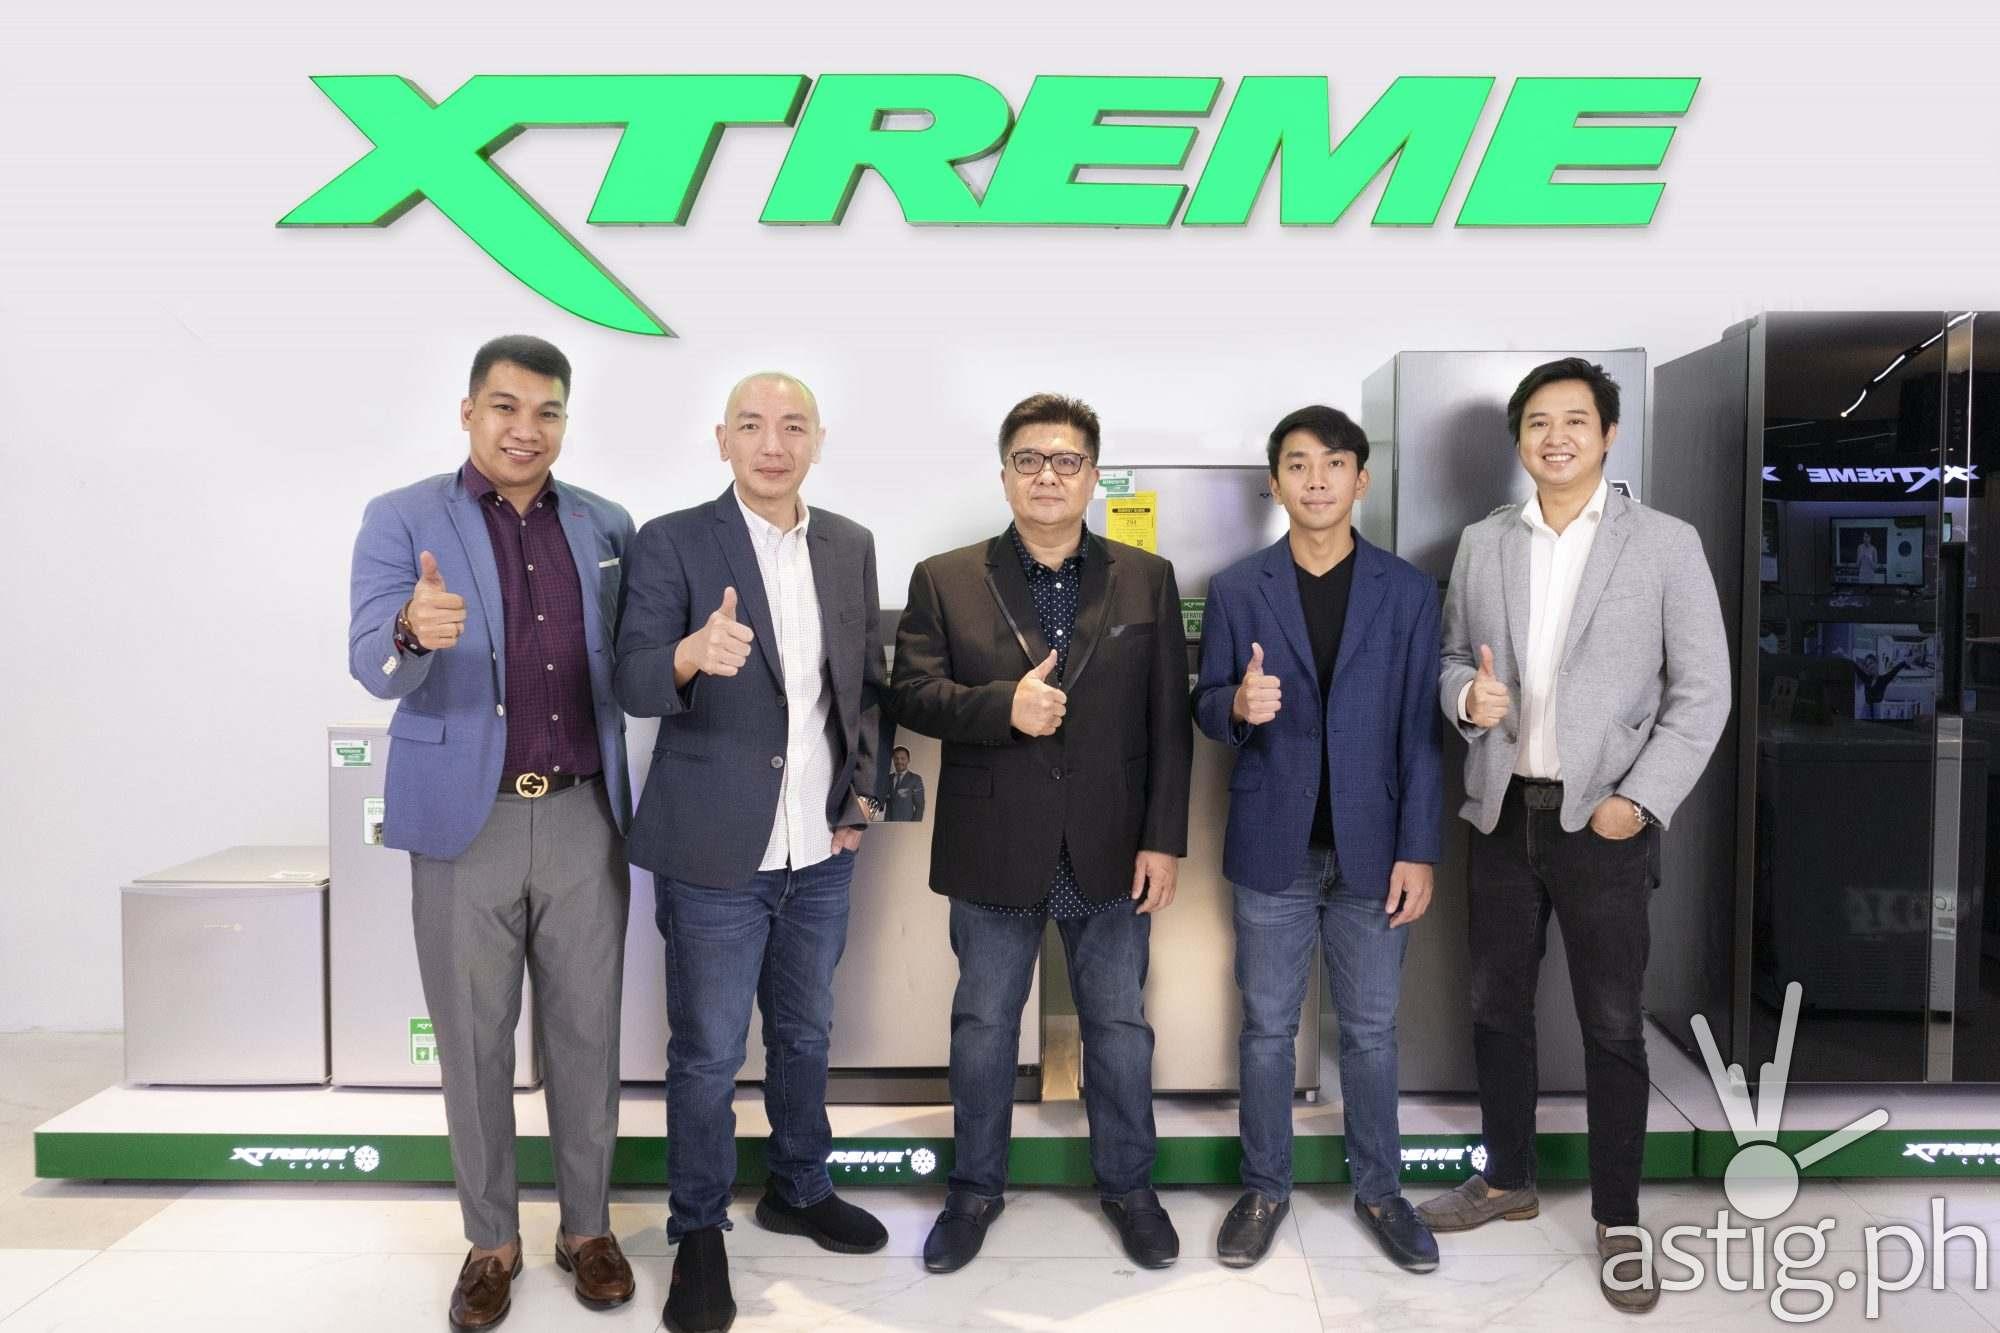 From left: XTREME Appliances VP – Business Development Mark del Mundo, XTREME Appliances — President Adrian Lim, SGC CEO Richard Lim, SGC Vice President Kevin Richard Lim, and XTREME Appliances VP – Marketing Stephen Cheng